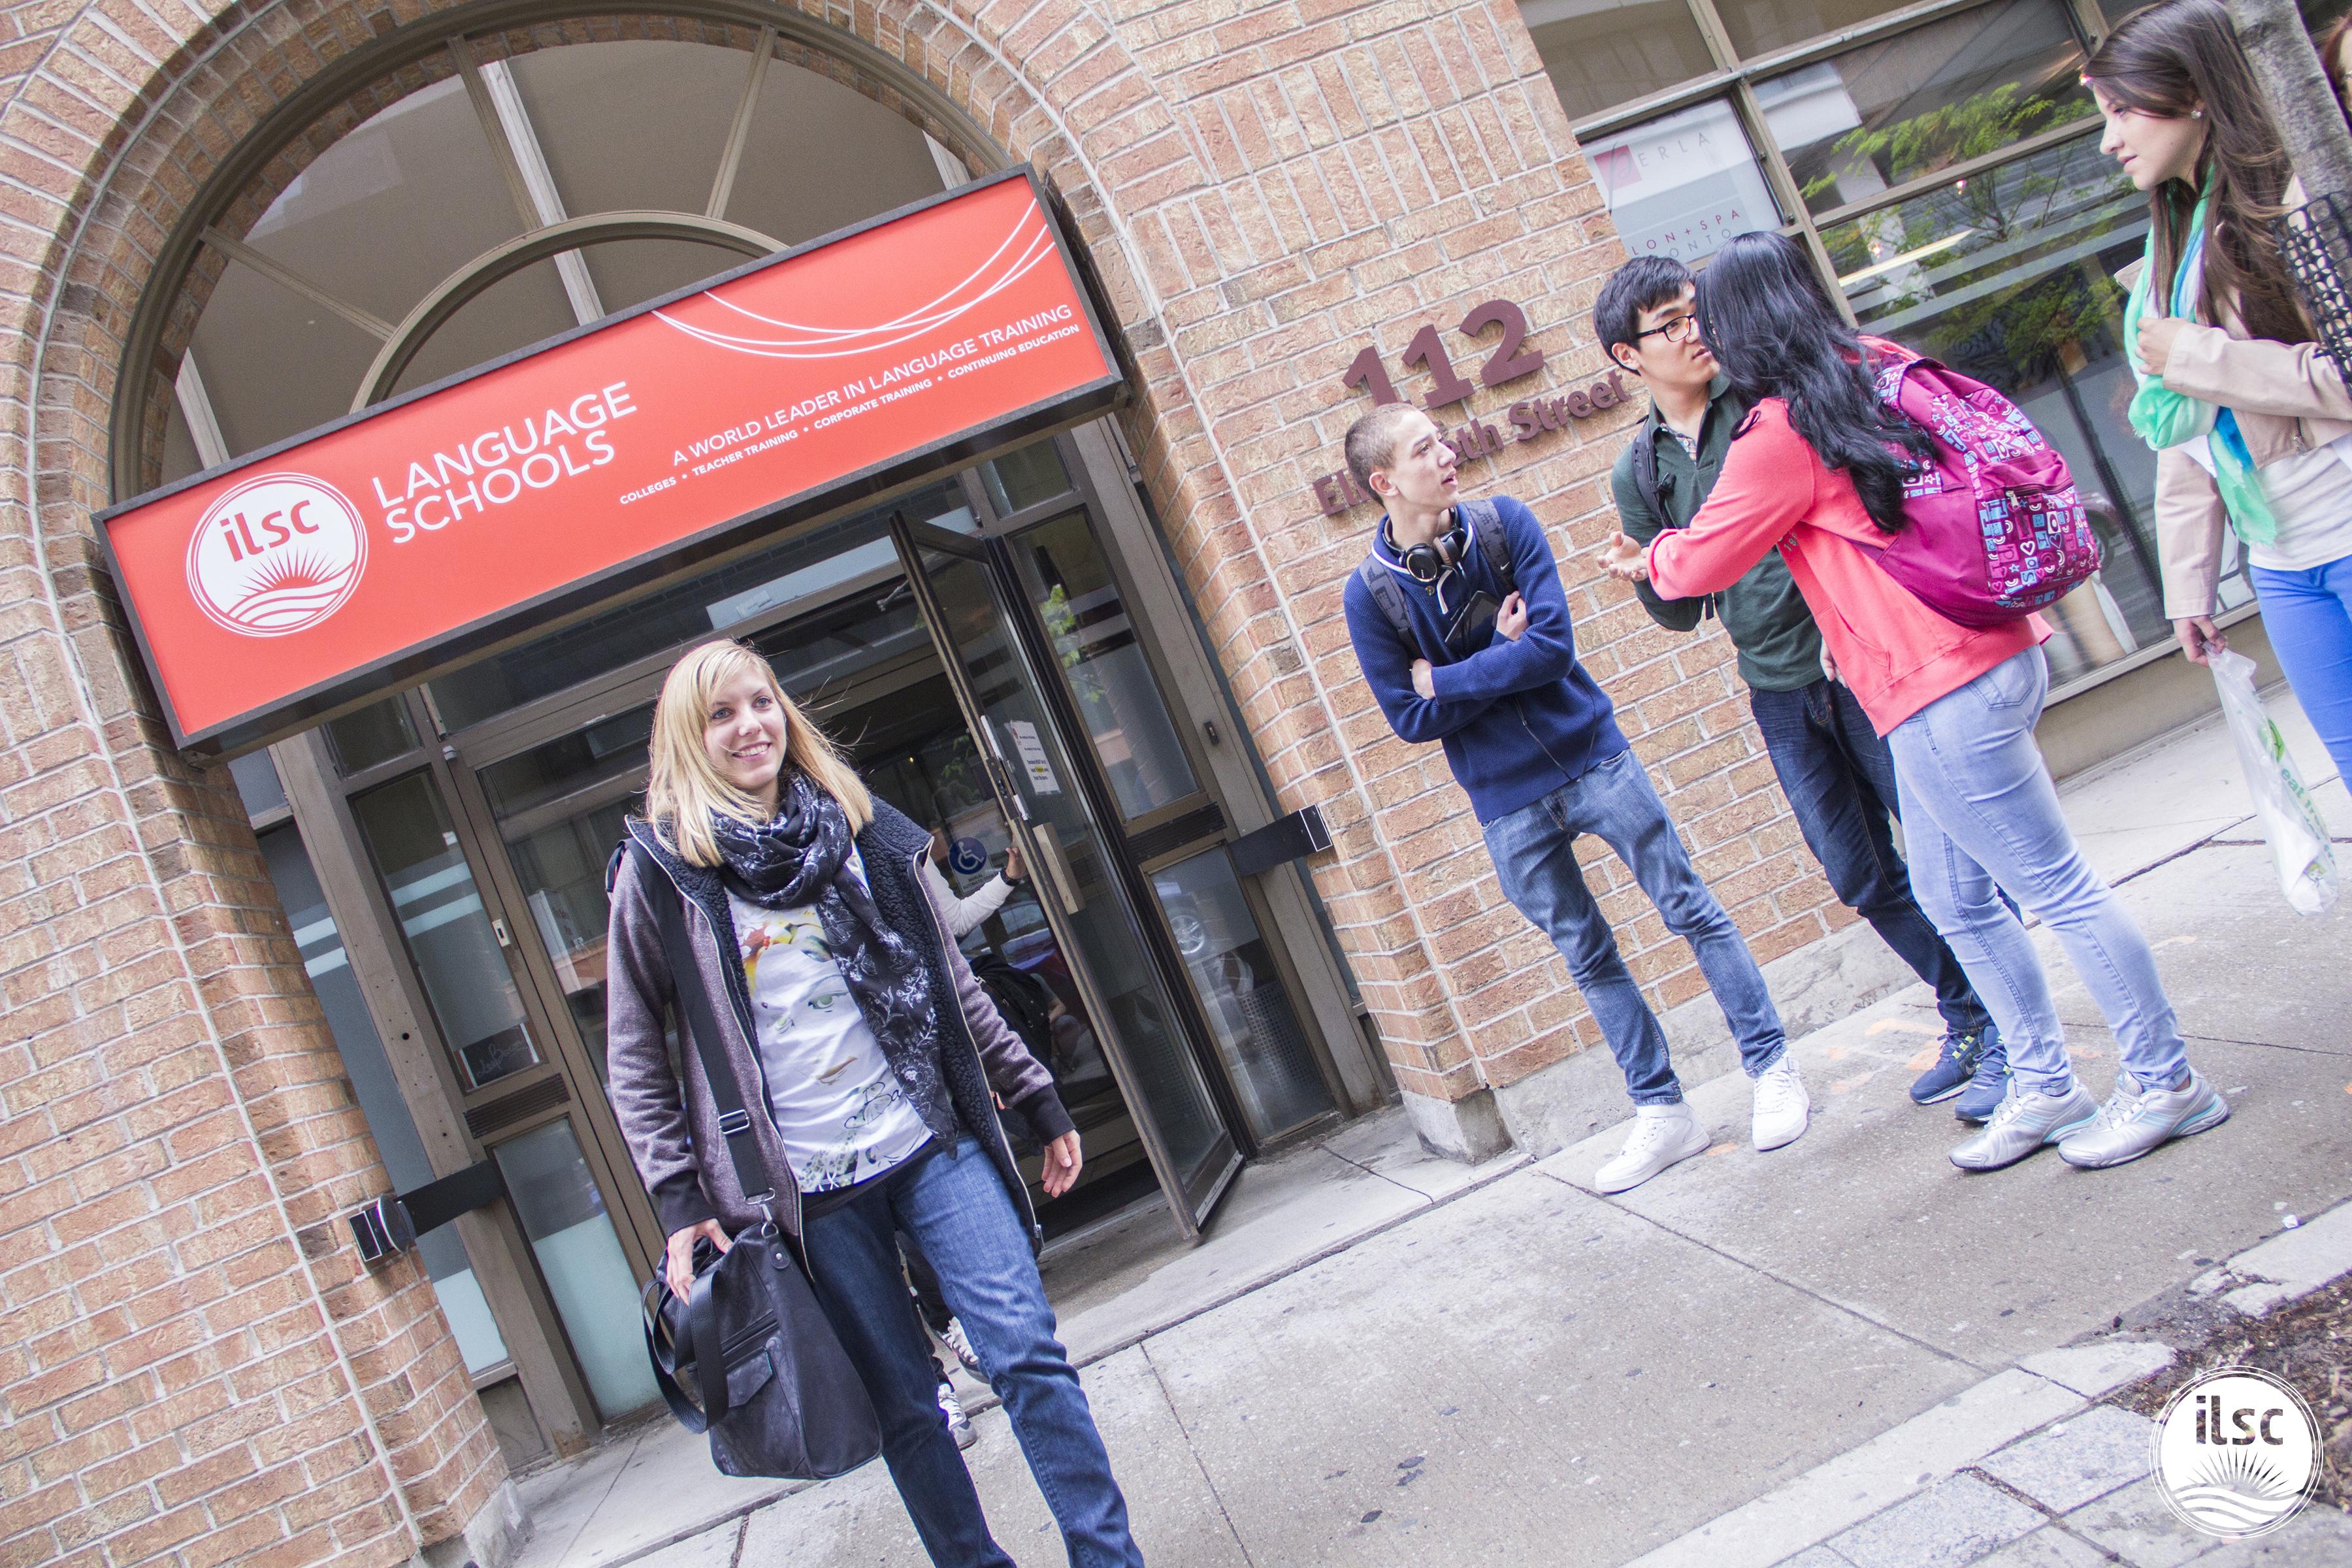 ILSC Language Schools Toronto Campus